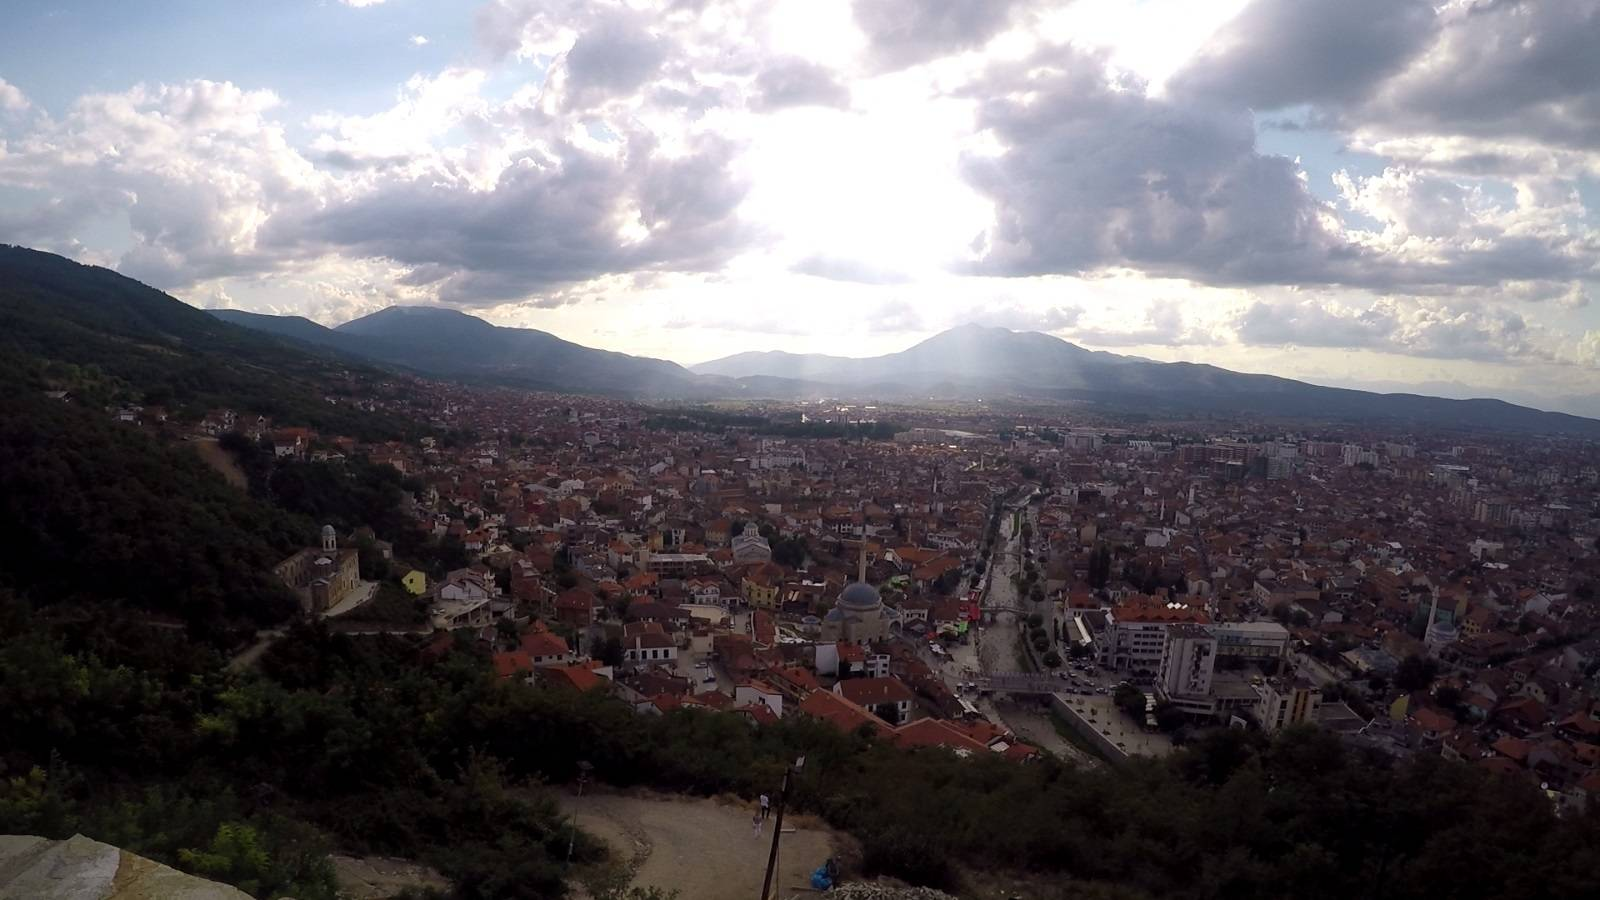 Photo 3: Prizren, petite ville accueillante du Kosovo